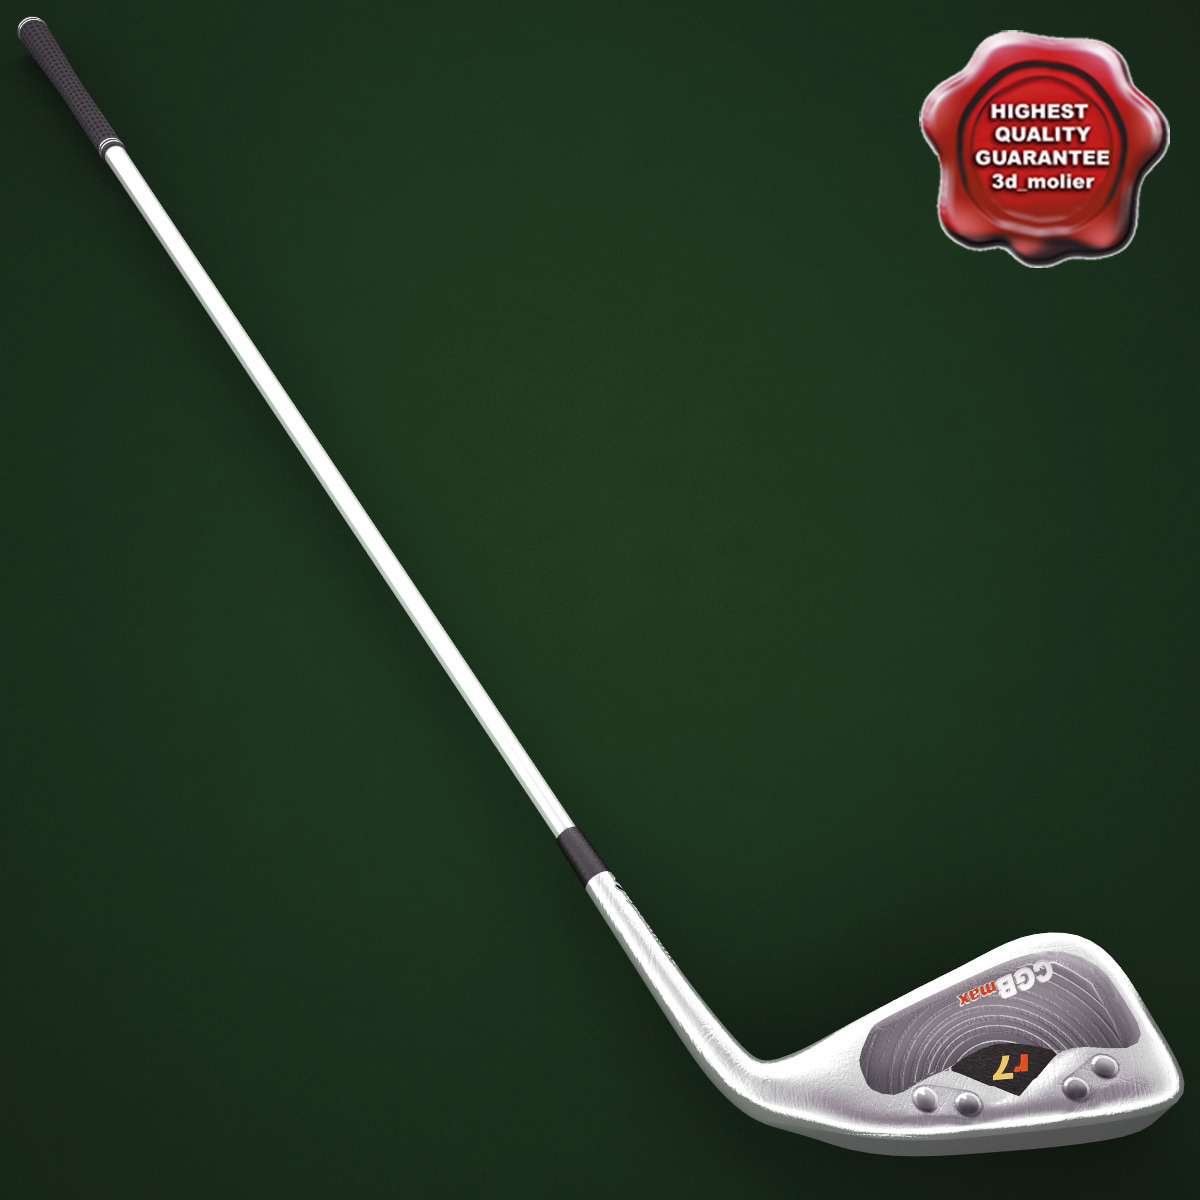 Golf_Stick_TaylorMade_R7_CGB_00.jpg